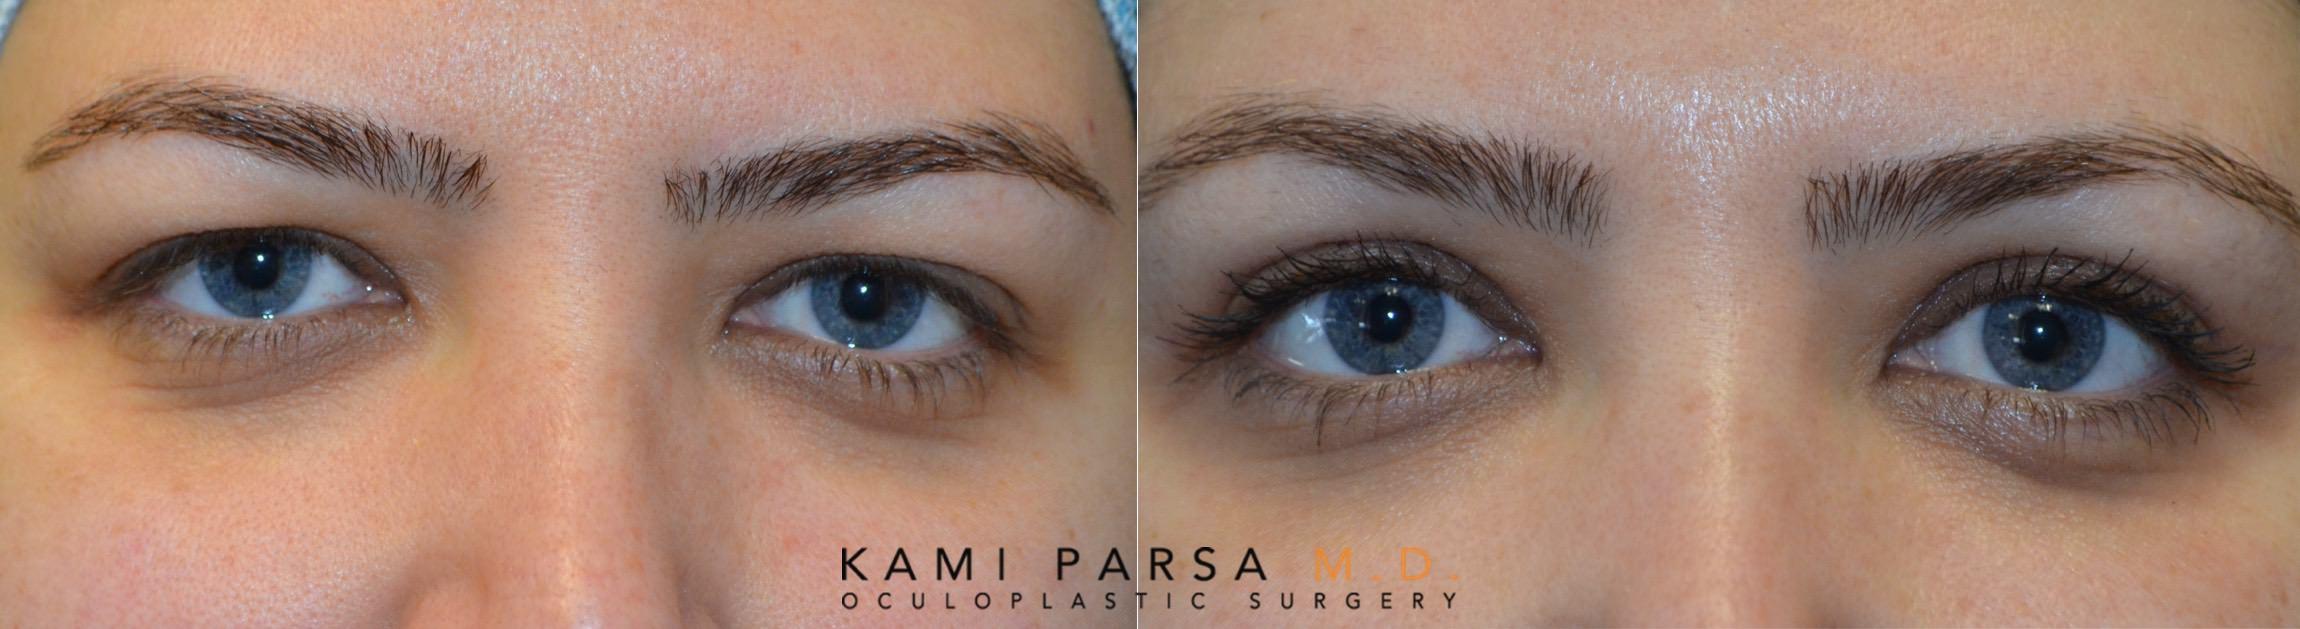 upper eyelid blepharoplasty.